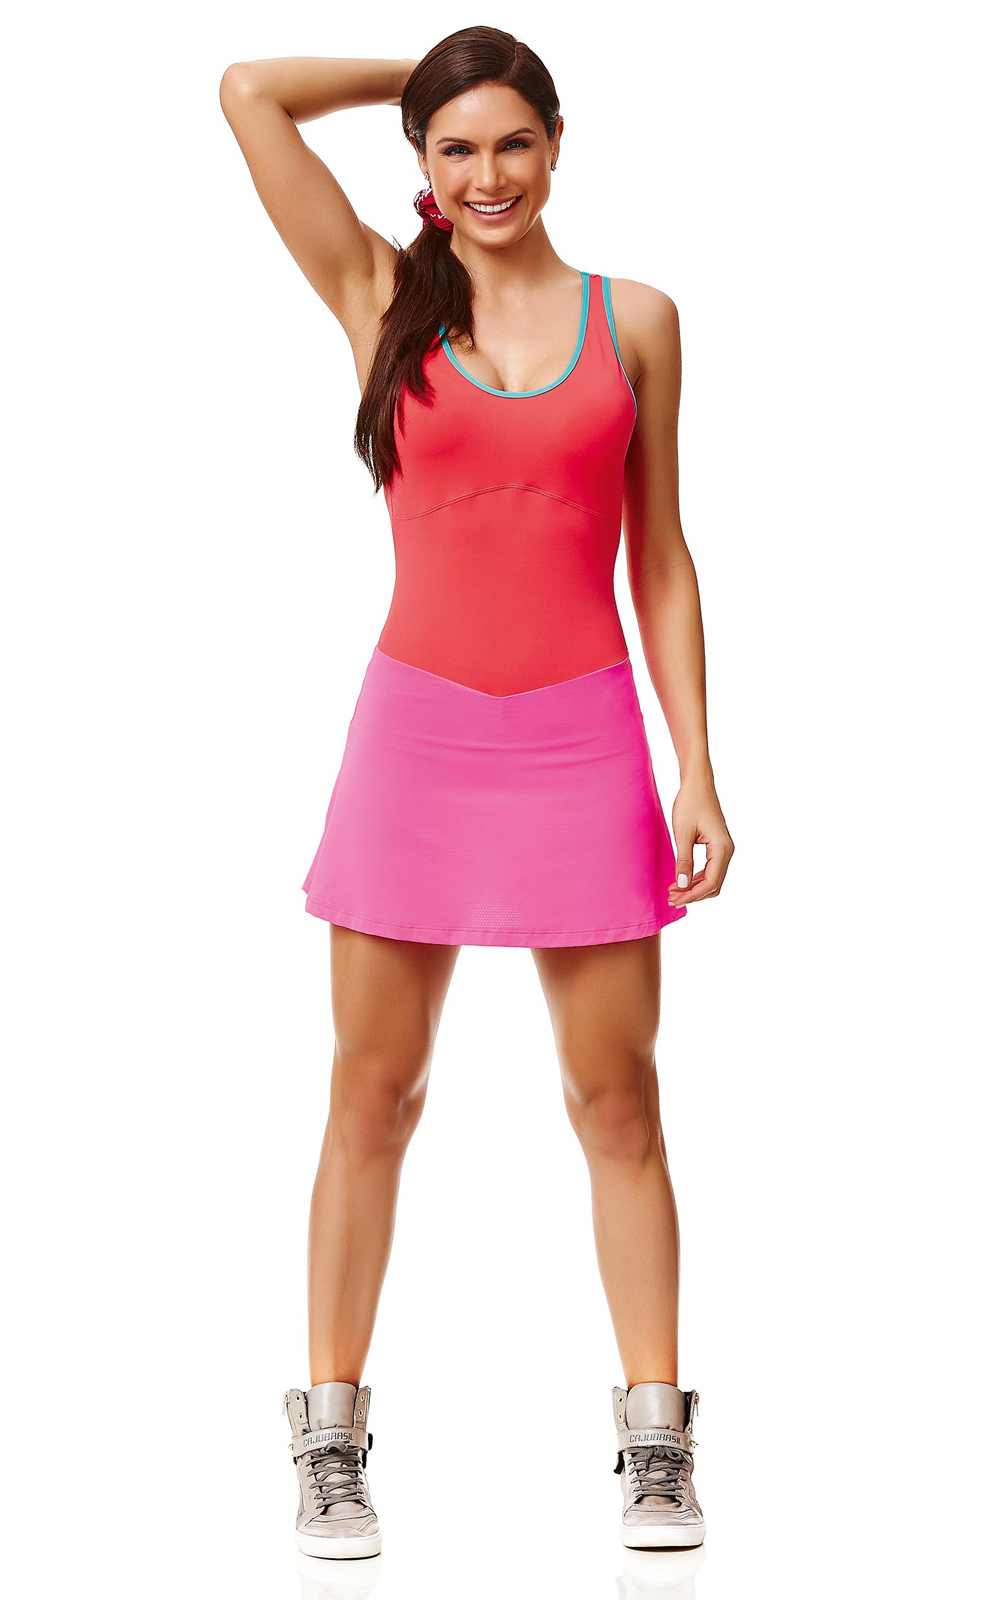 fitness-cajubrasil-dress-fun-00.jpg